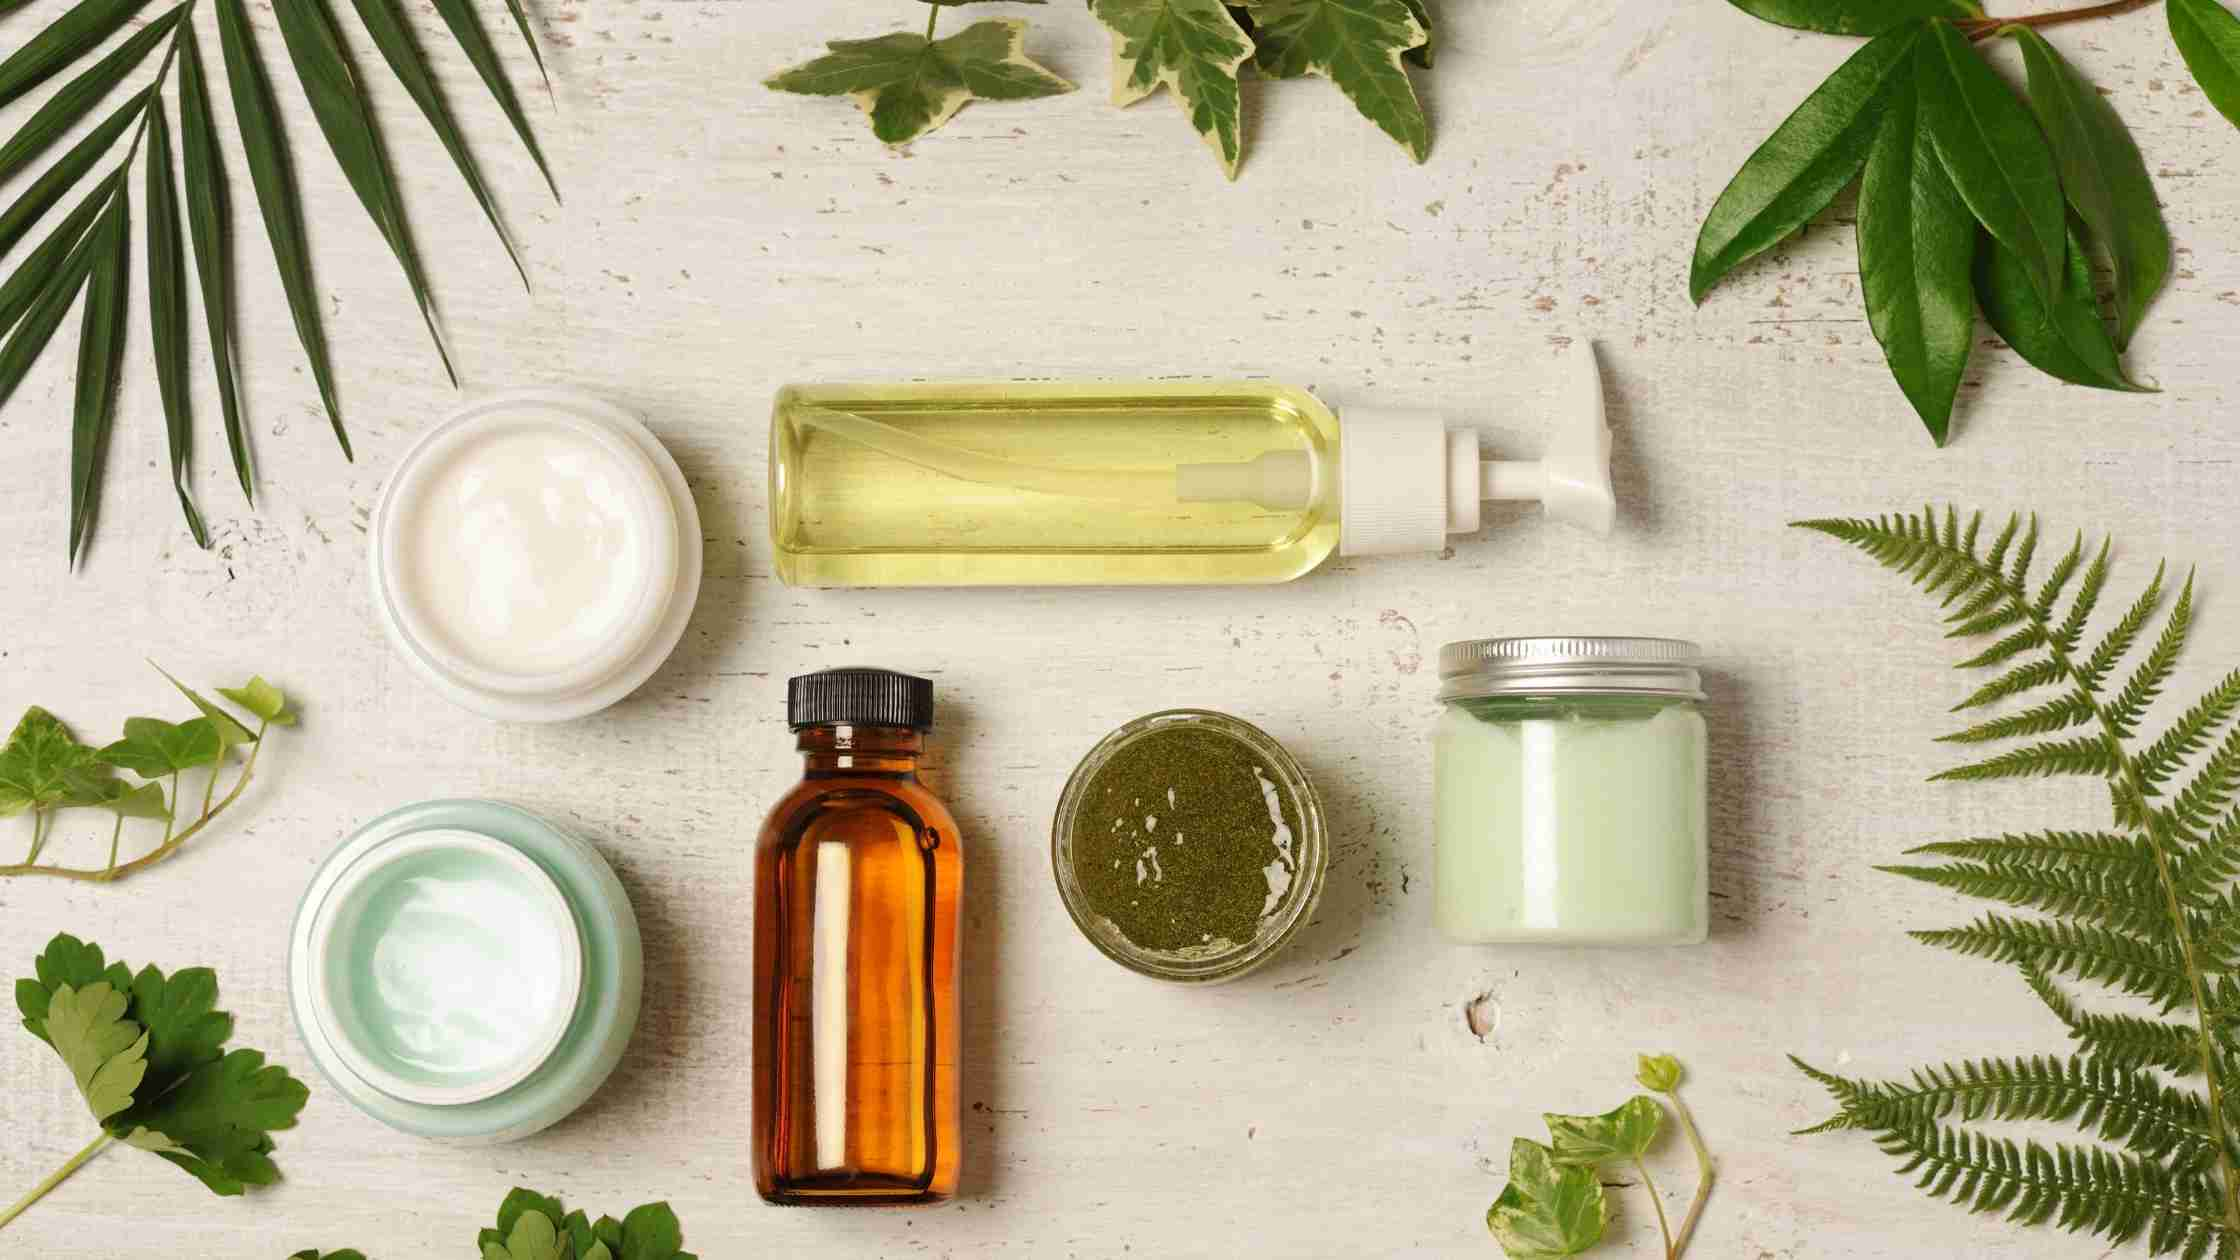 Zelena kozmetika ali angleško clean beauty